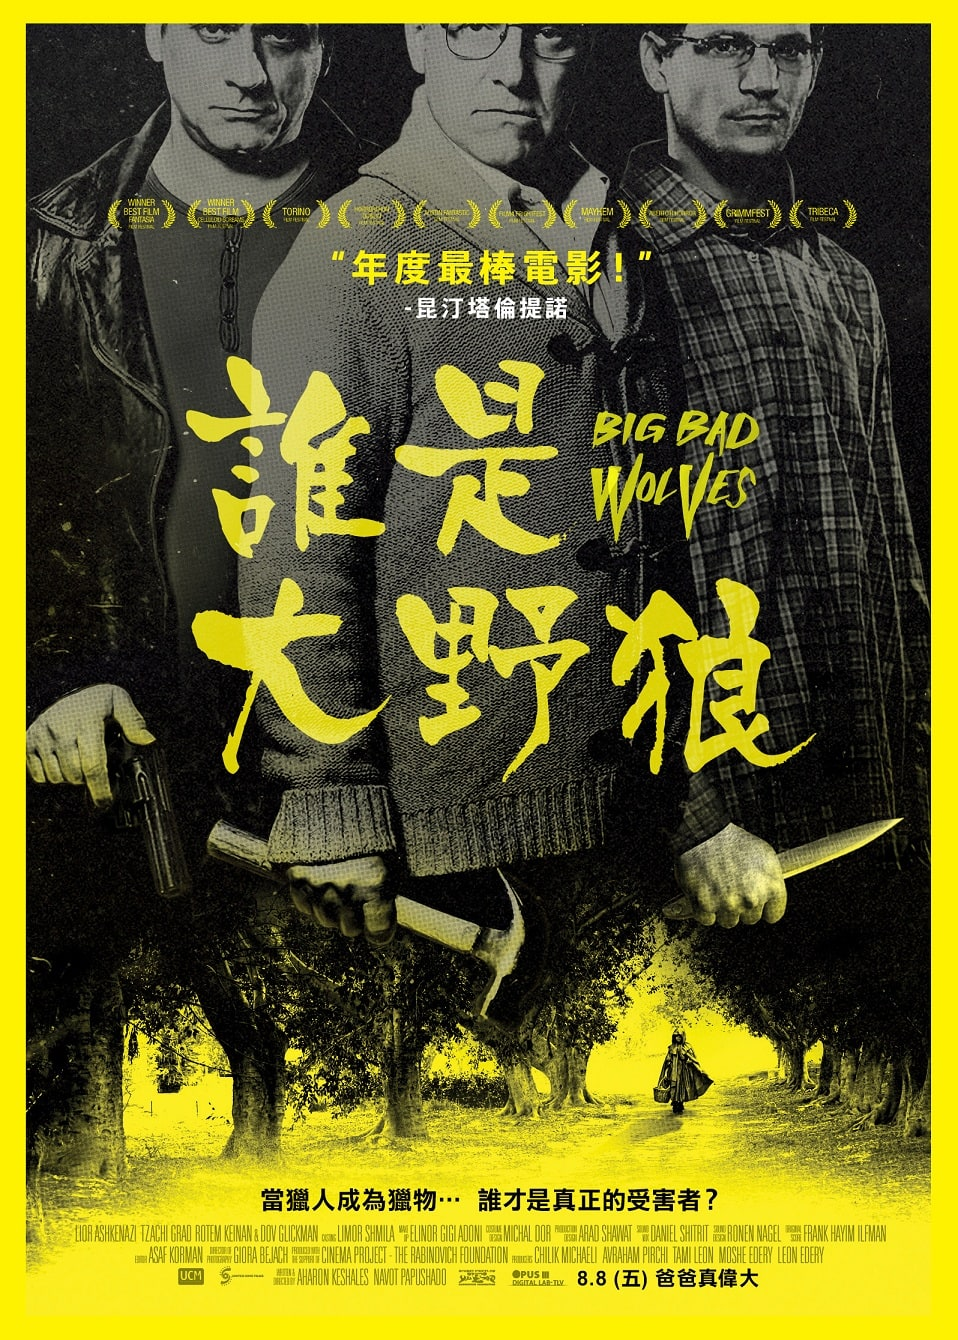 big bad wolf movie poster - photo #21